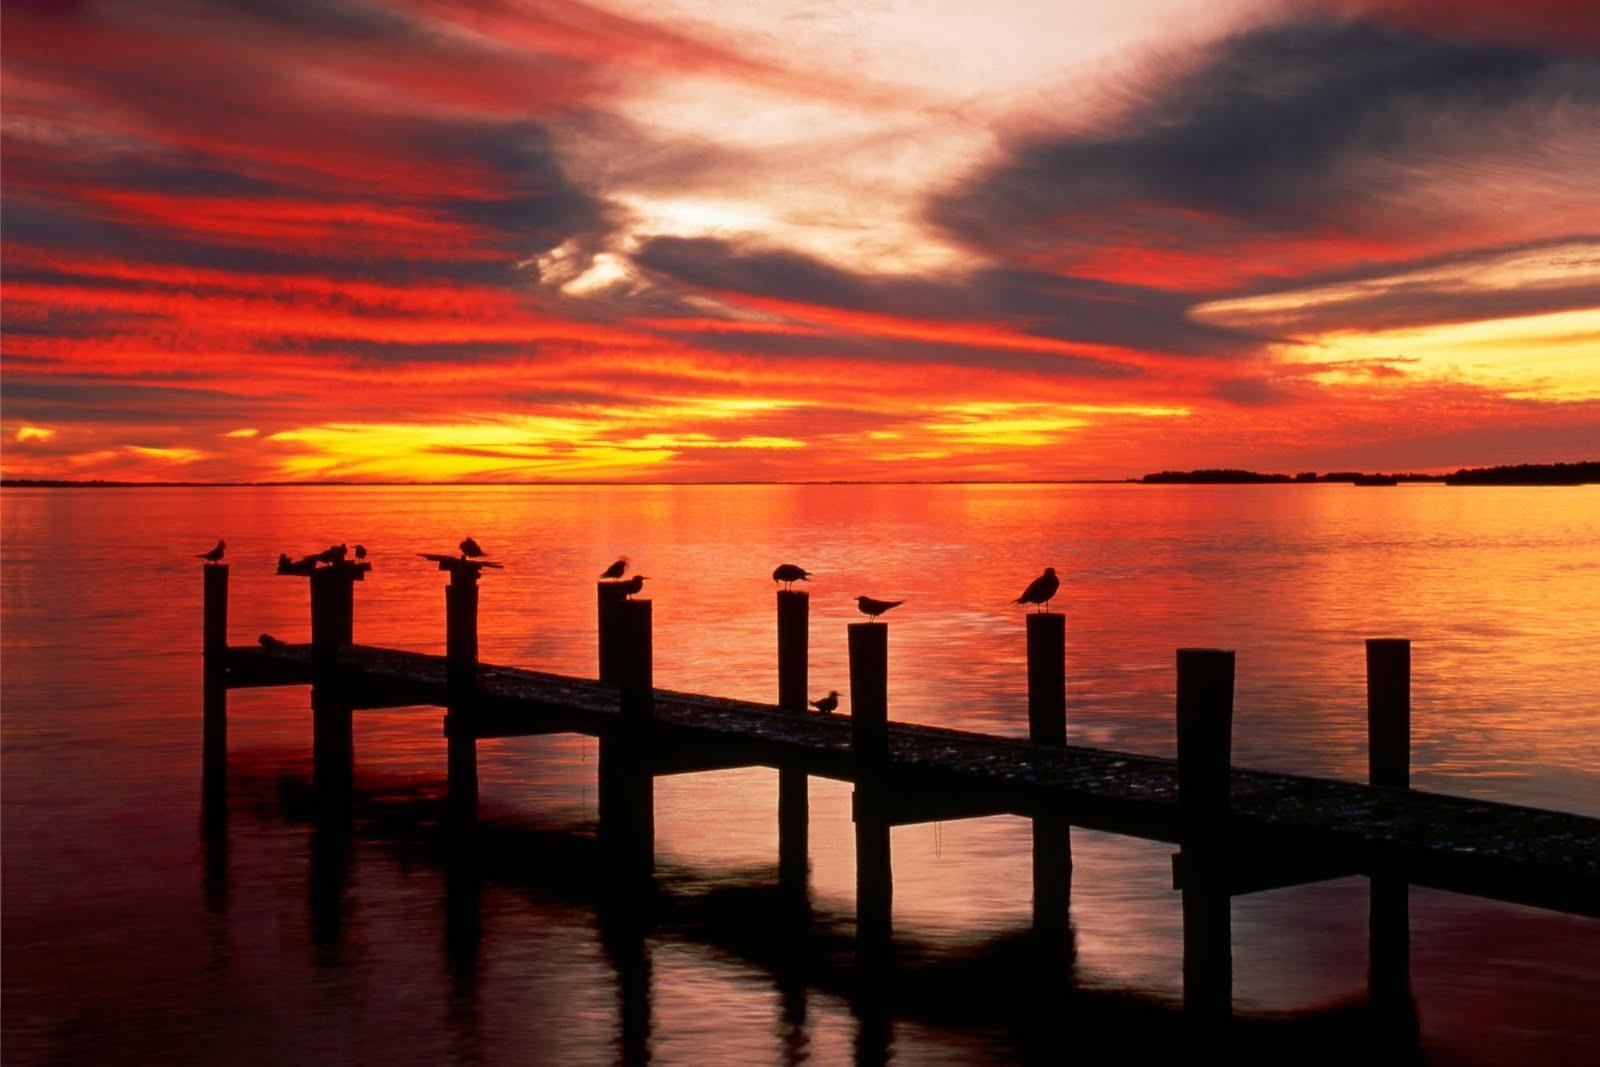 http://3.bp.blogspot.com/-aktAq2L1i2Y/Tdbbh0mcz7I/AAAAAAAAAVI/EMgLoDpGrSQ/s1600/sunsetmantra+%252815%2529.jpg